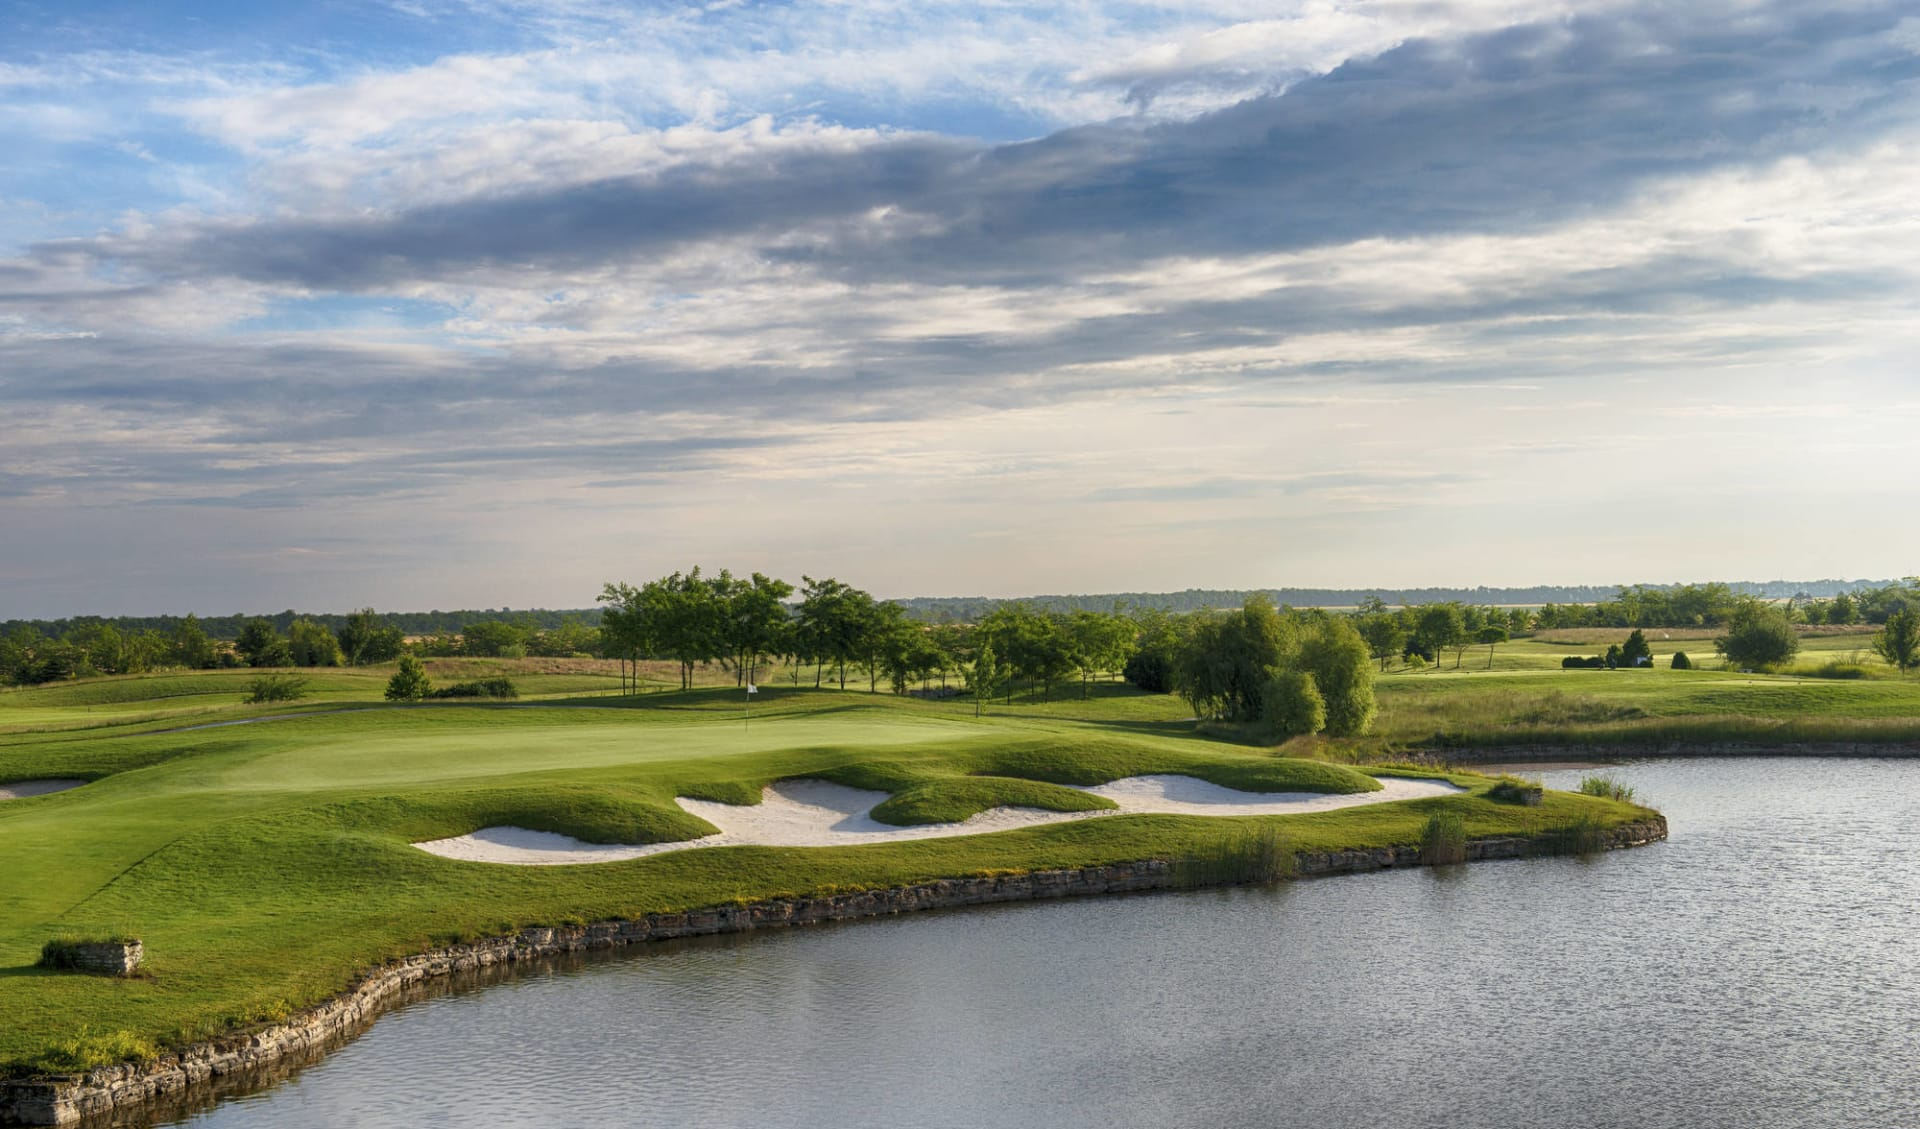 03.07. - 10.07.2022 Golf Plauschwoche in Bulgarien ab Varna: activities: lighthouse 16 high